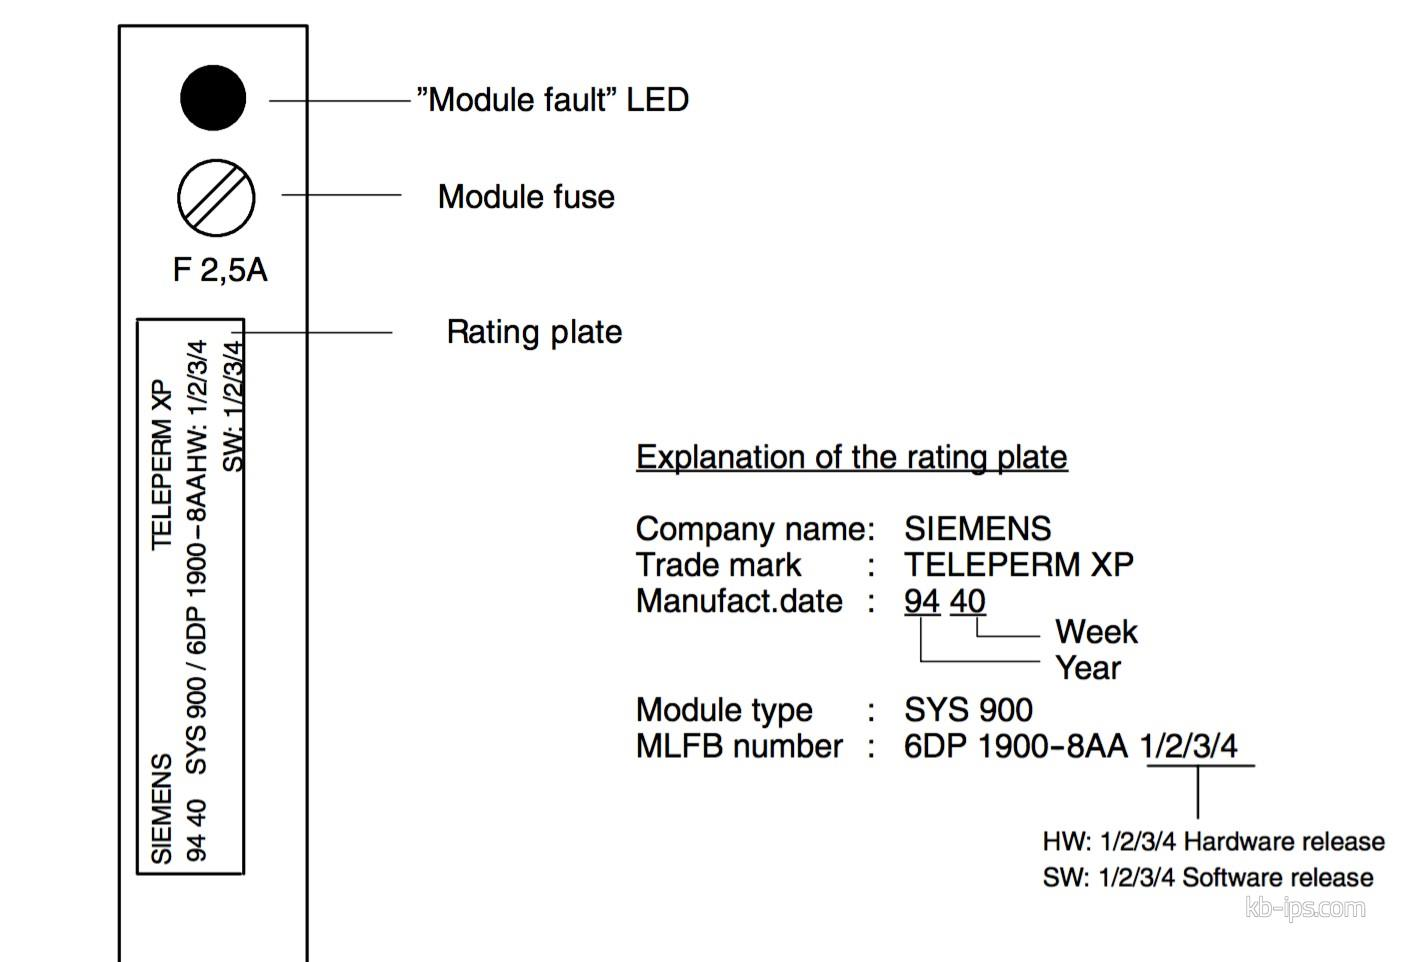 Teleperm Xp Manual Mopar C180 Fuse Box Array Deda Monitoring Module Sys 900 Kb Ips Rh